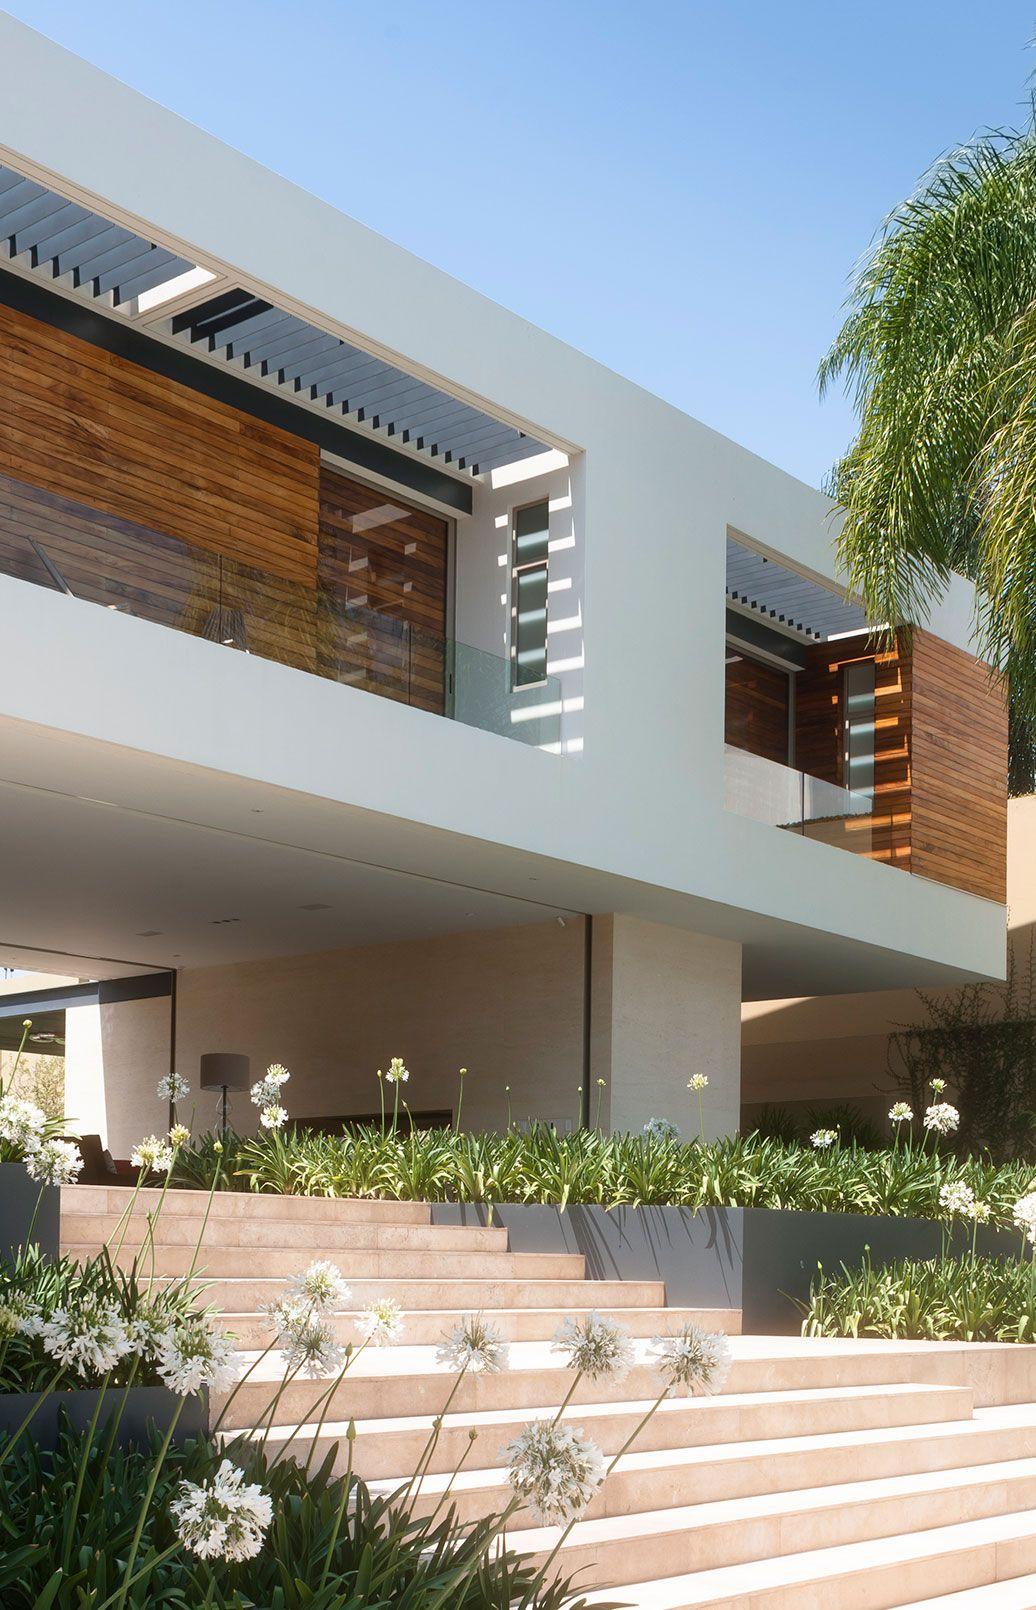 christian y claudio gantous arquitectos / casa sj, méxico